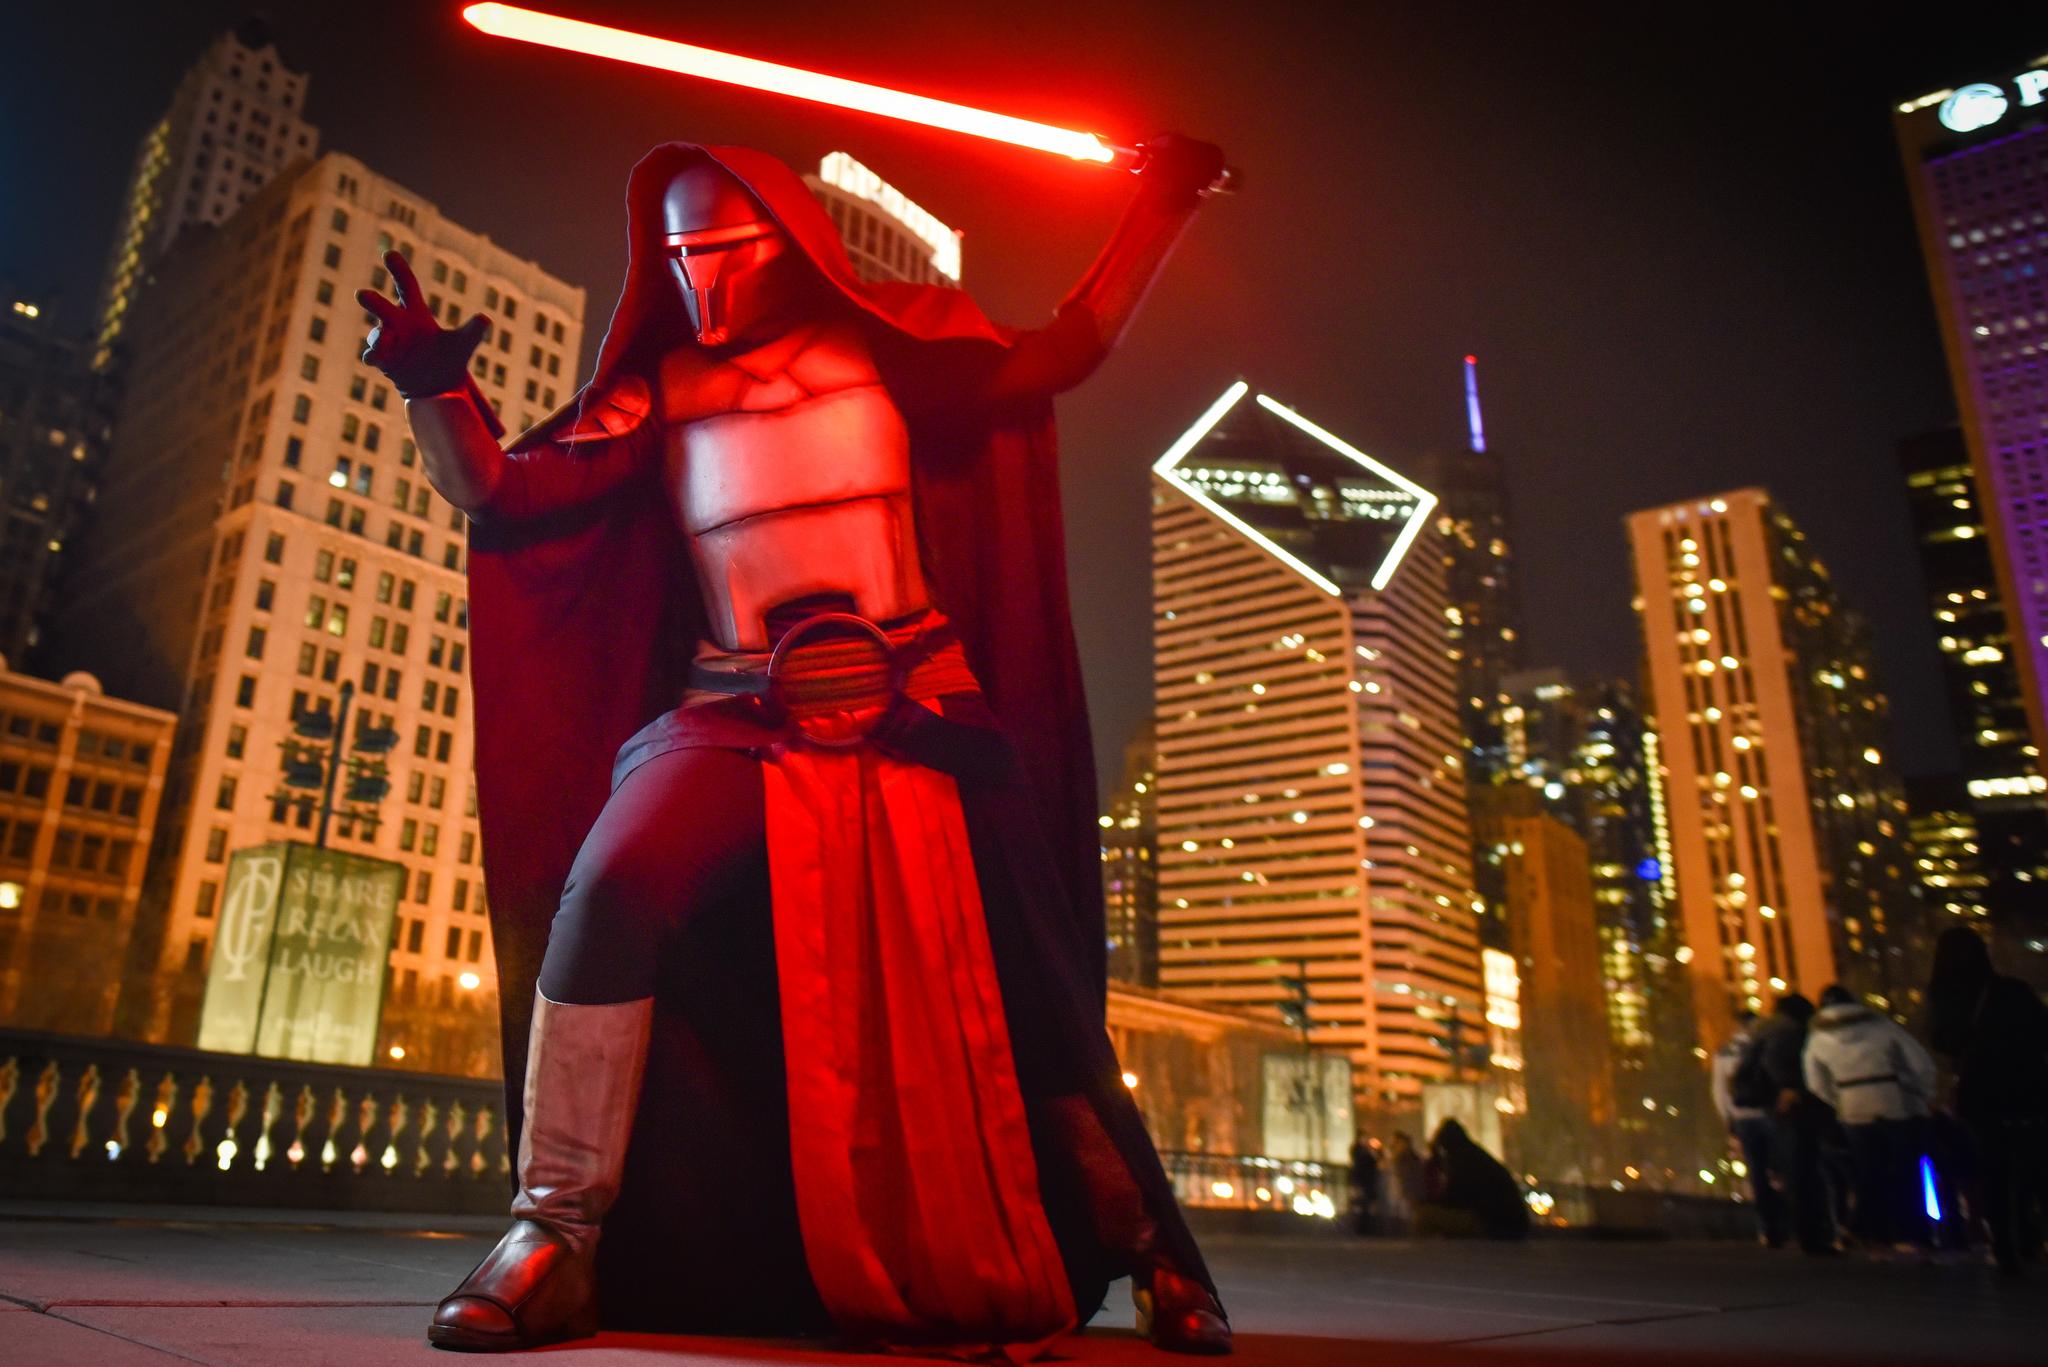 2019.04.14 - Star Wars Celebration Chicago 288876.JPG